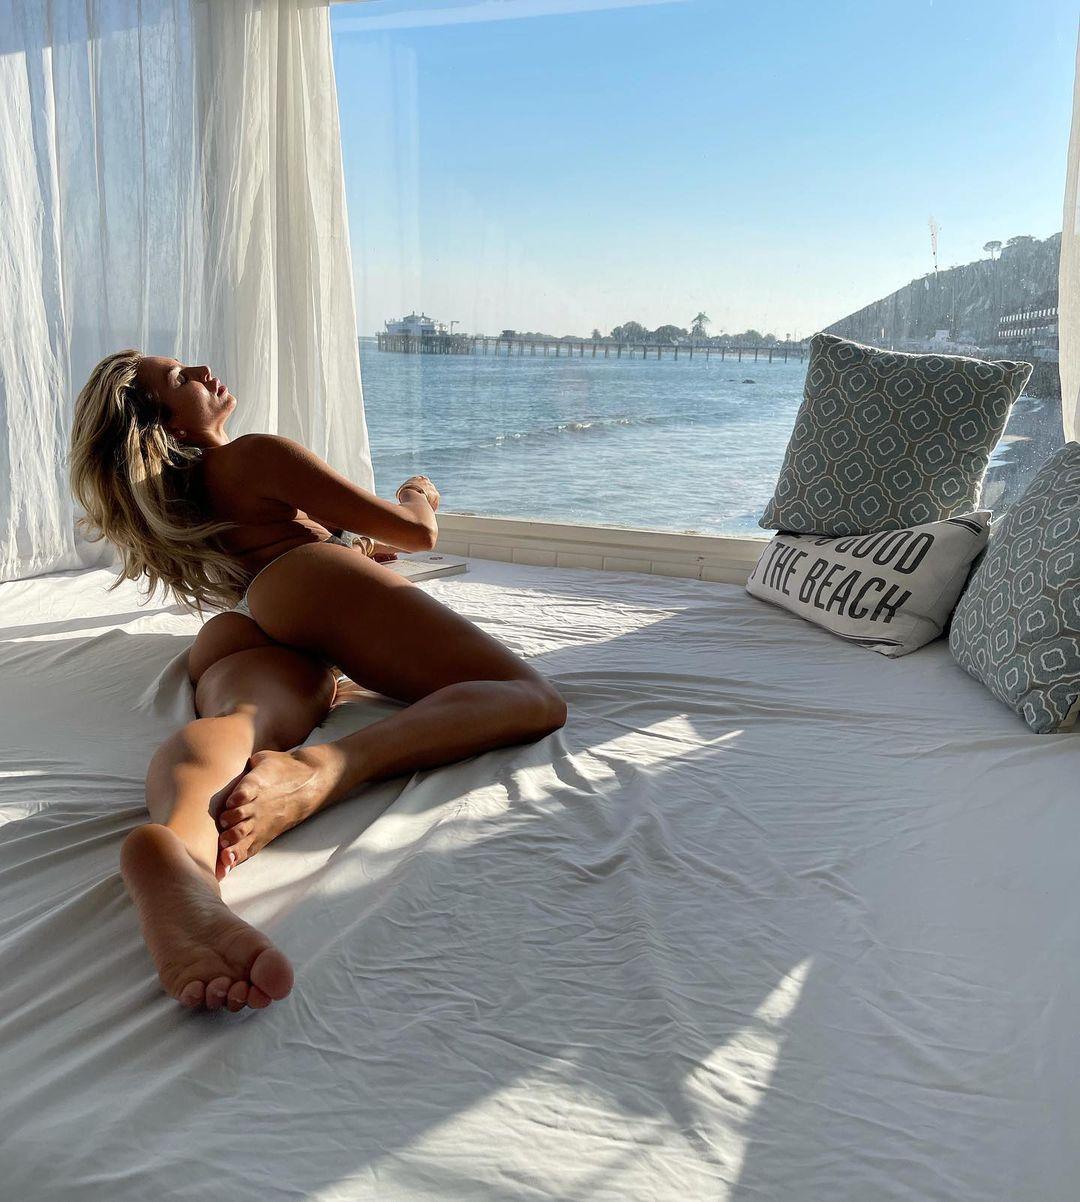 Khloe Terae Fantastic Ass And Boobs